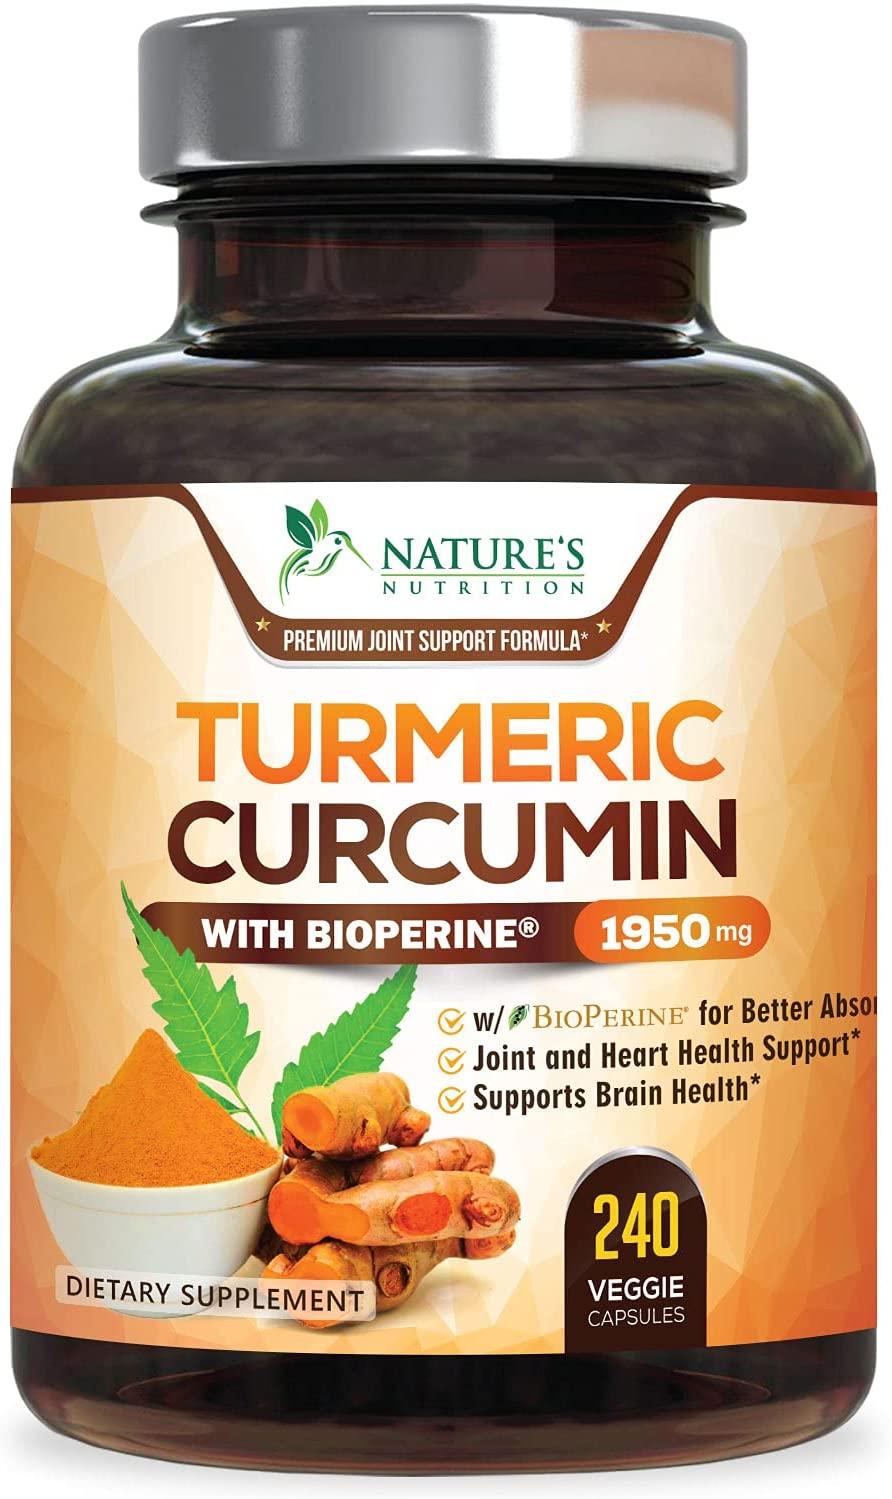 Review of Turmeric Curcumin with BioPerine 95% Curcuminoids 1950mg with Black Pepper